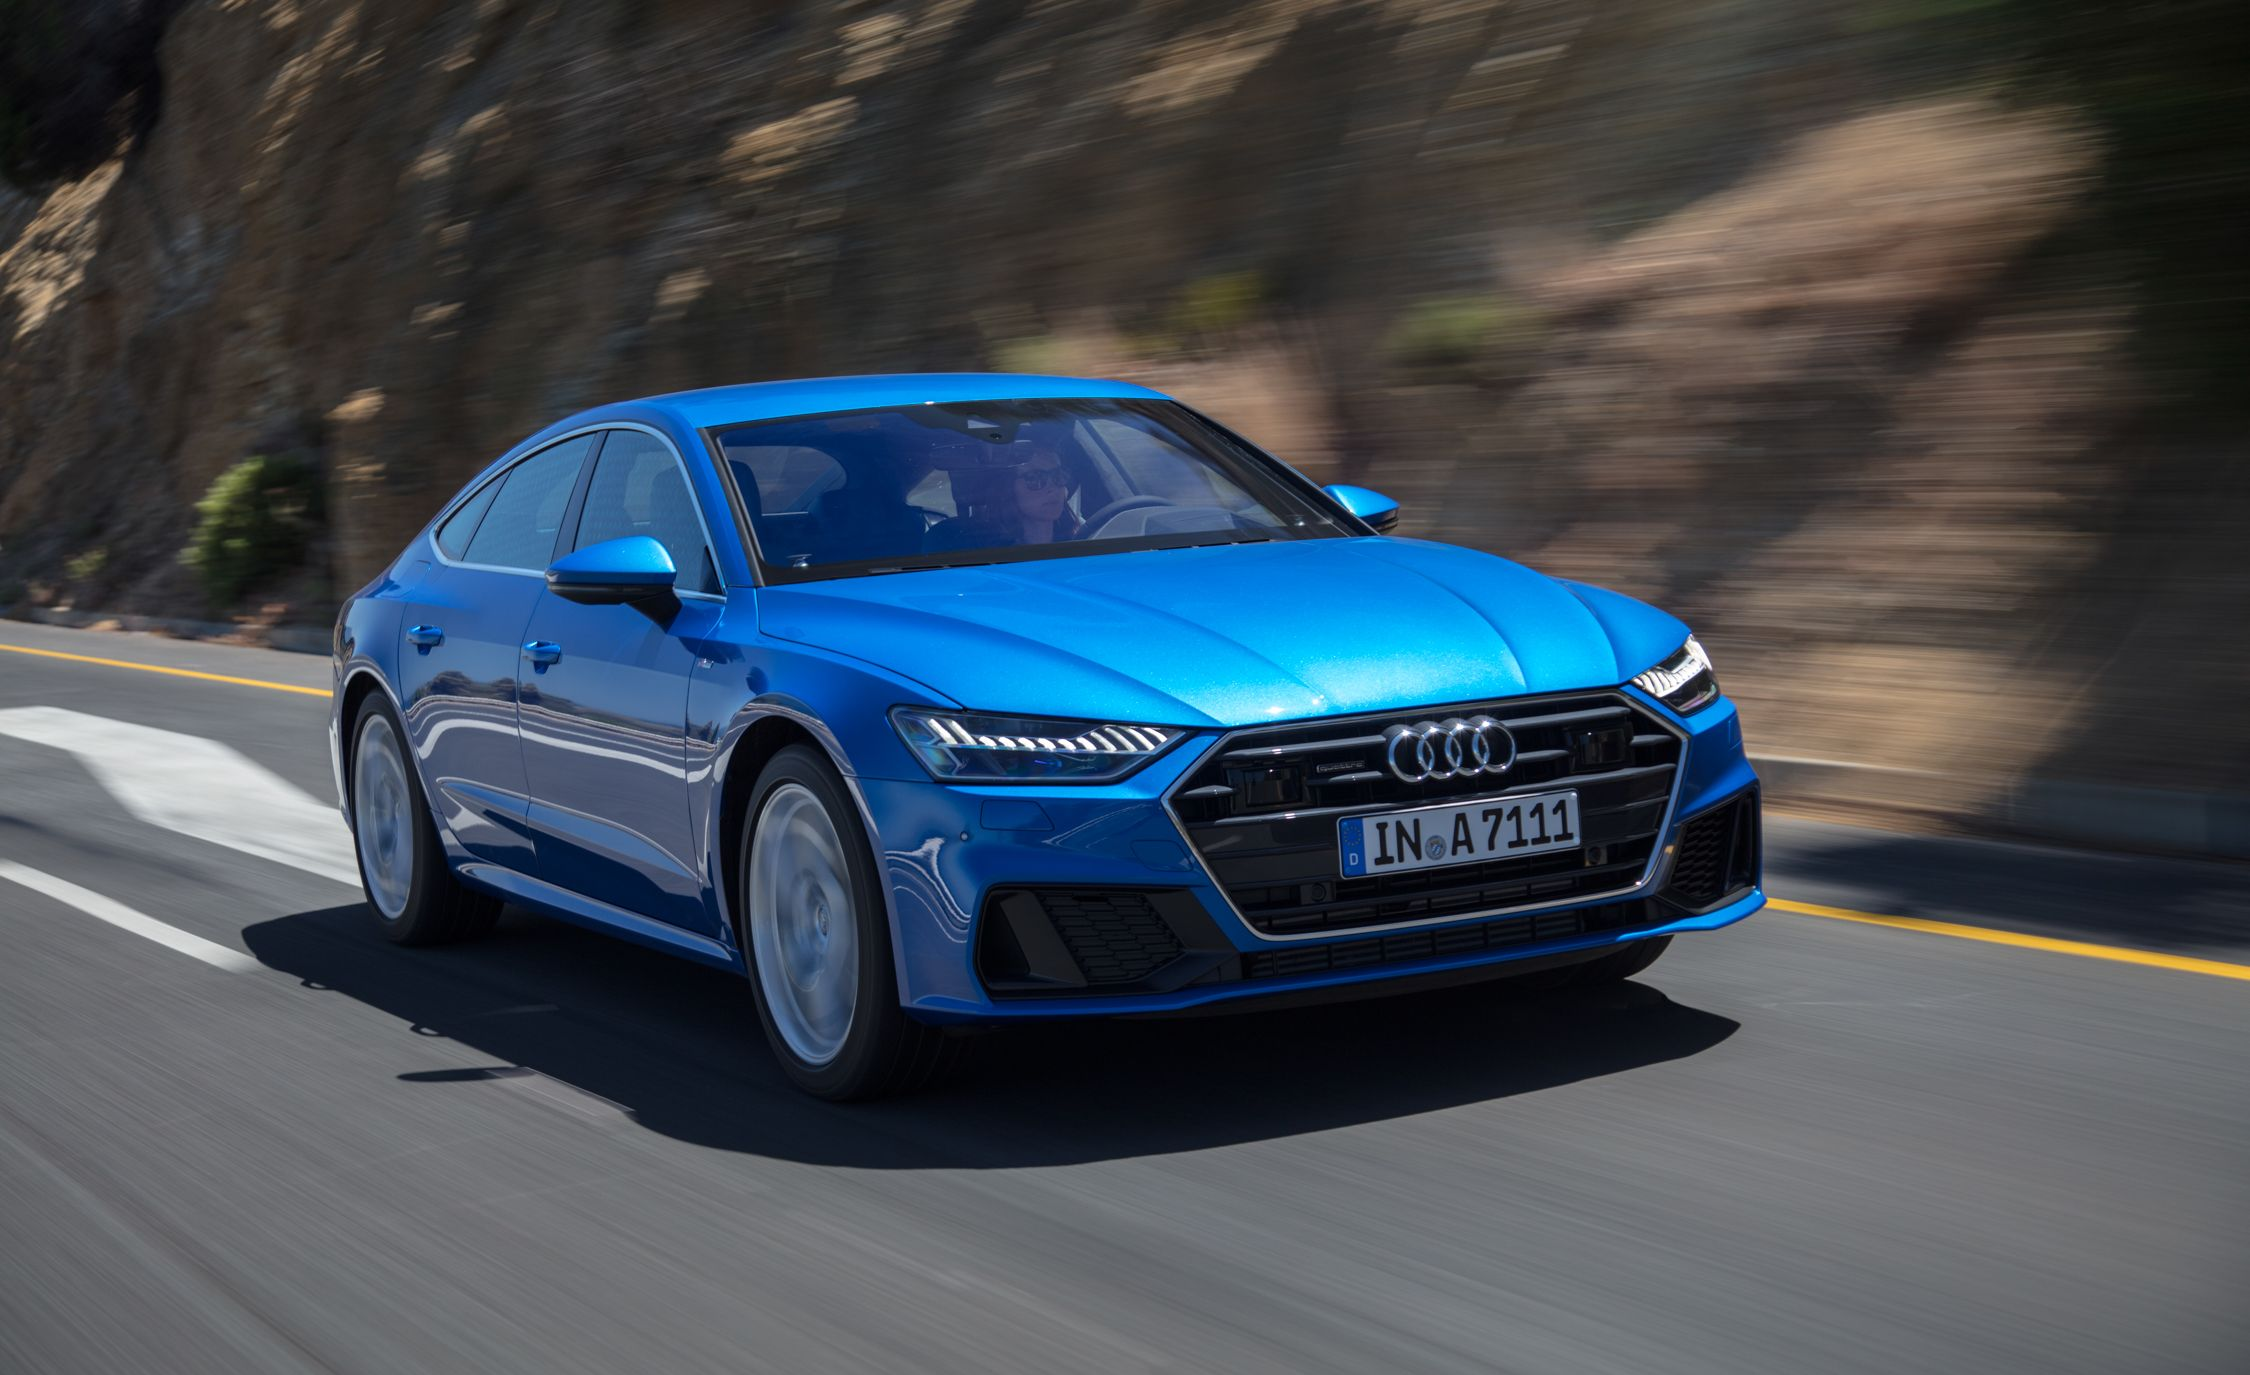 2019-Audi-A7-Sportback-111-1.jpg